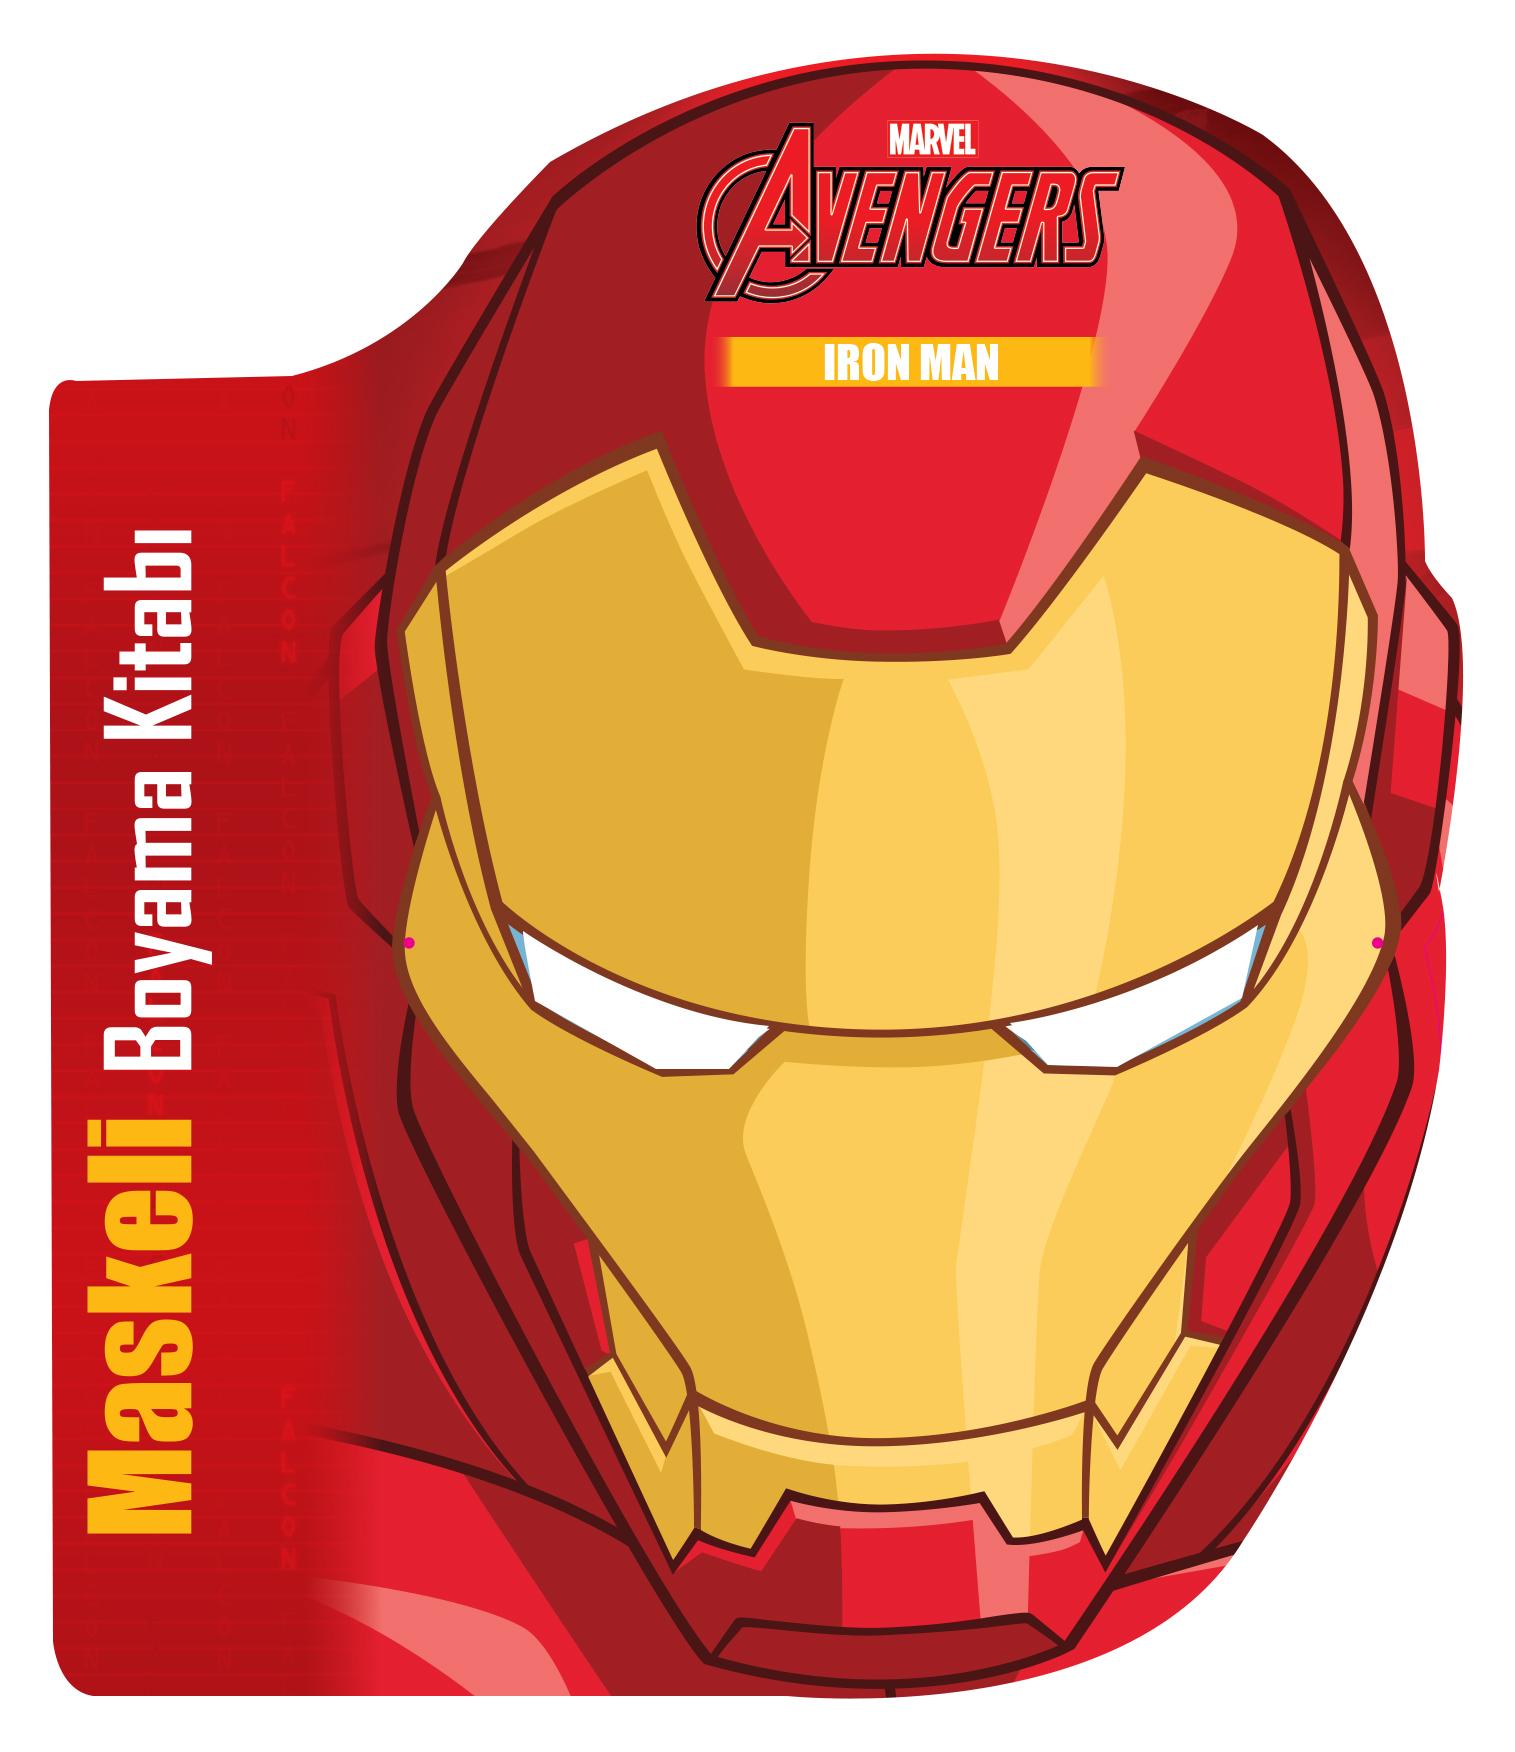 Avengers Iron Man Maskeli Boyama Kitabi Beta Cocuk